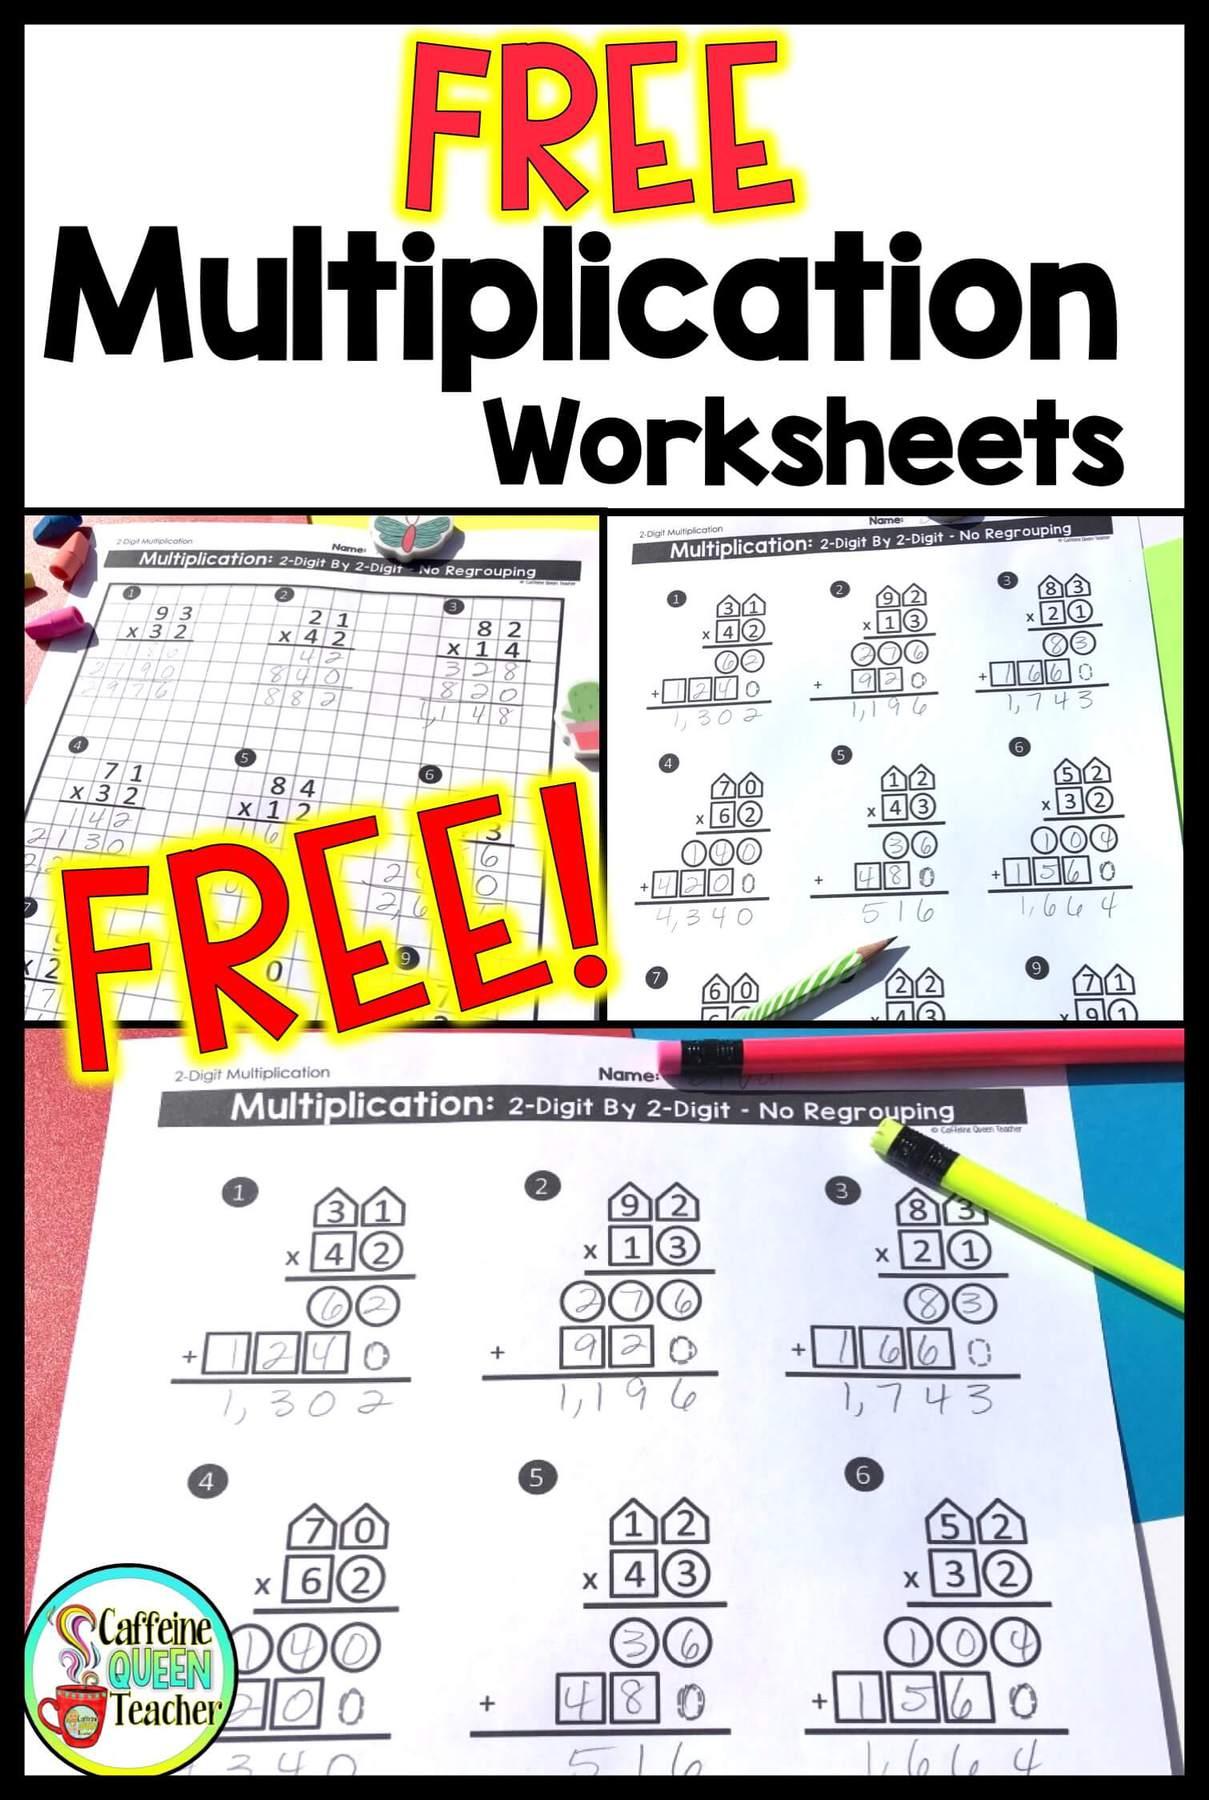 small resolution of 2-Digit Multiplication Worksheets: Differentiated - Caffeine Queen Teacher